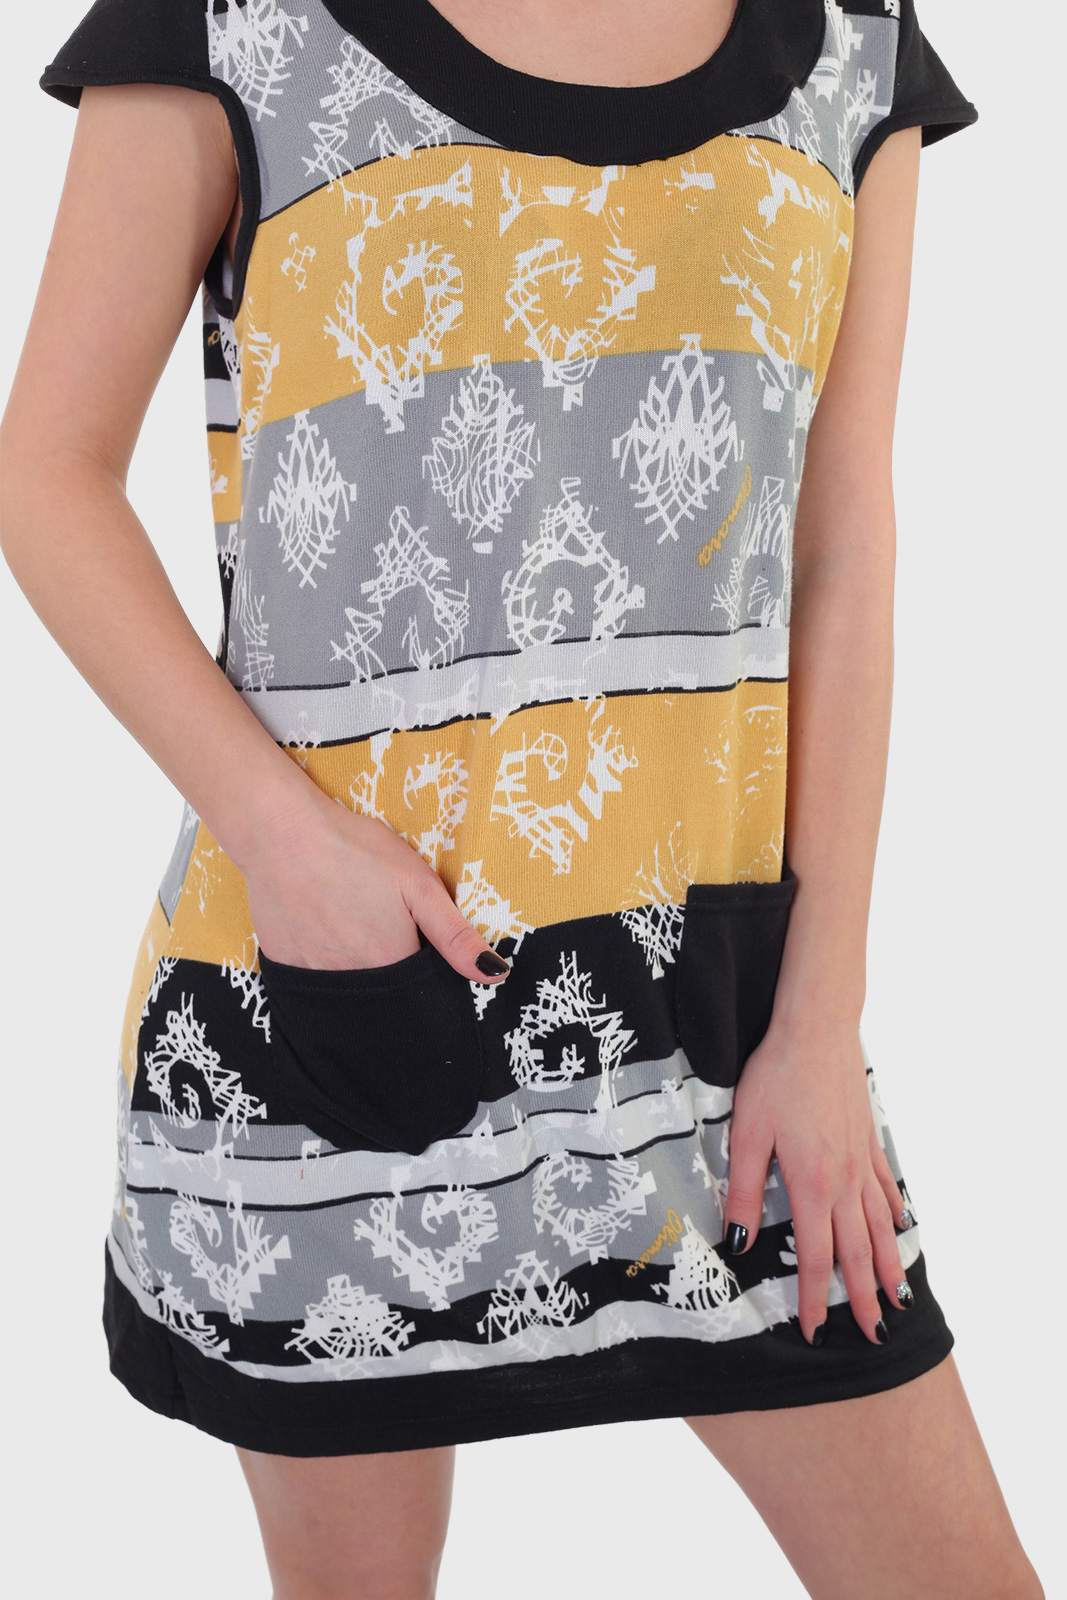 Смелое платье-туника Le Grenier с кокетливыми кармашками.